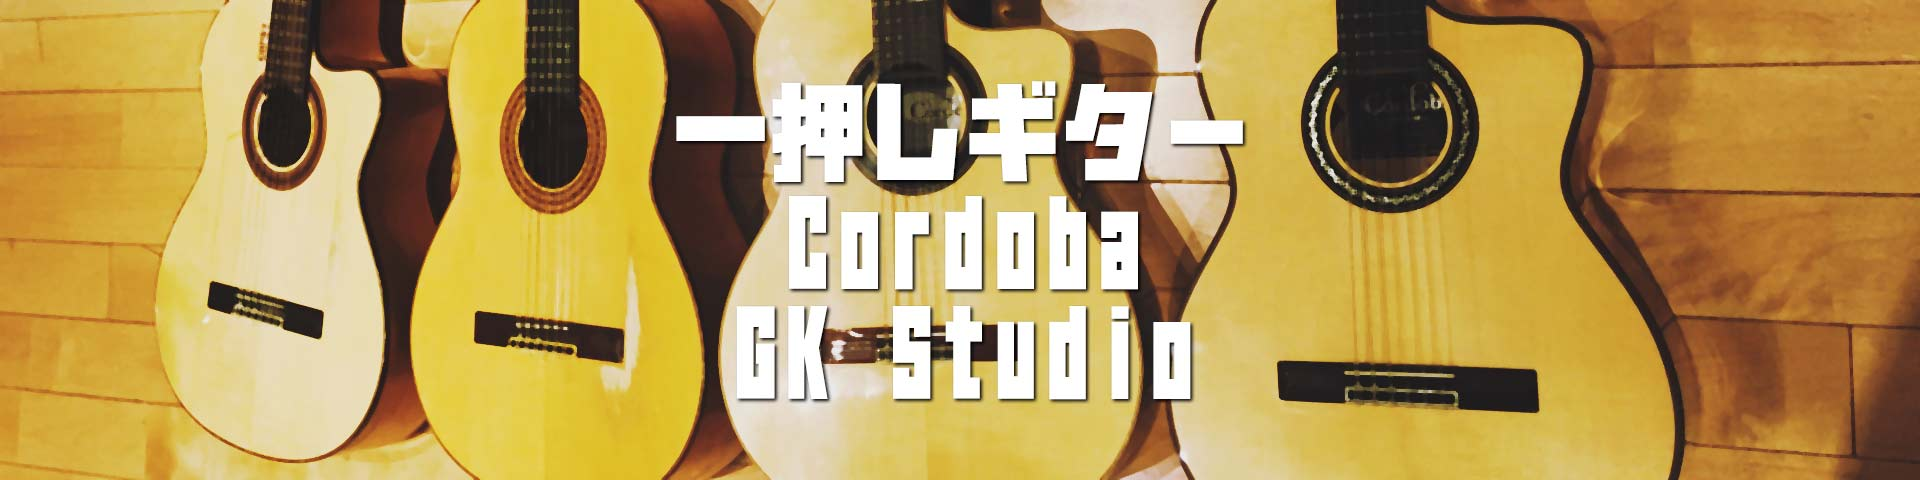 Cordoba製 GK-Studioが一押しギター